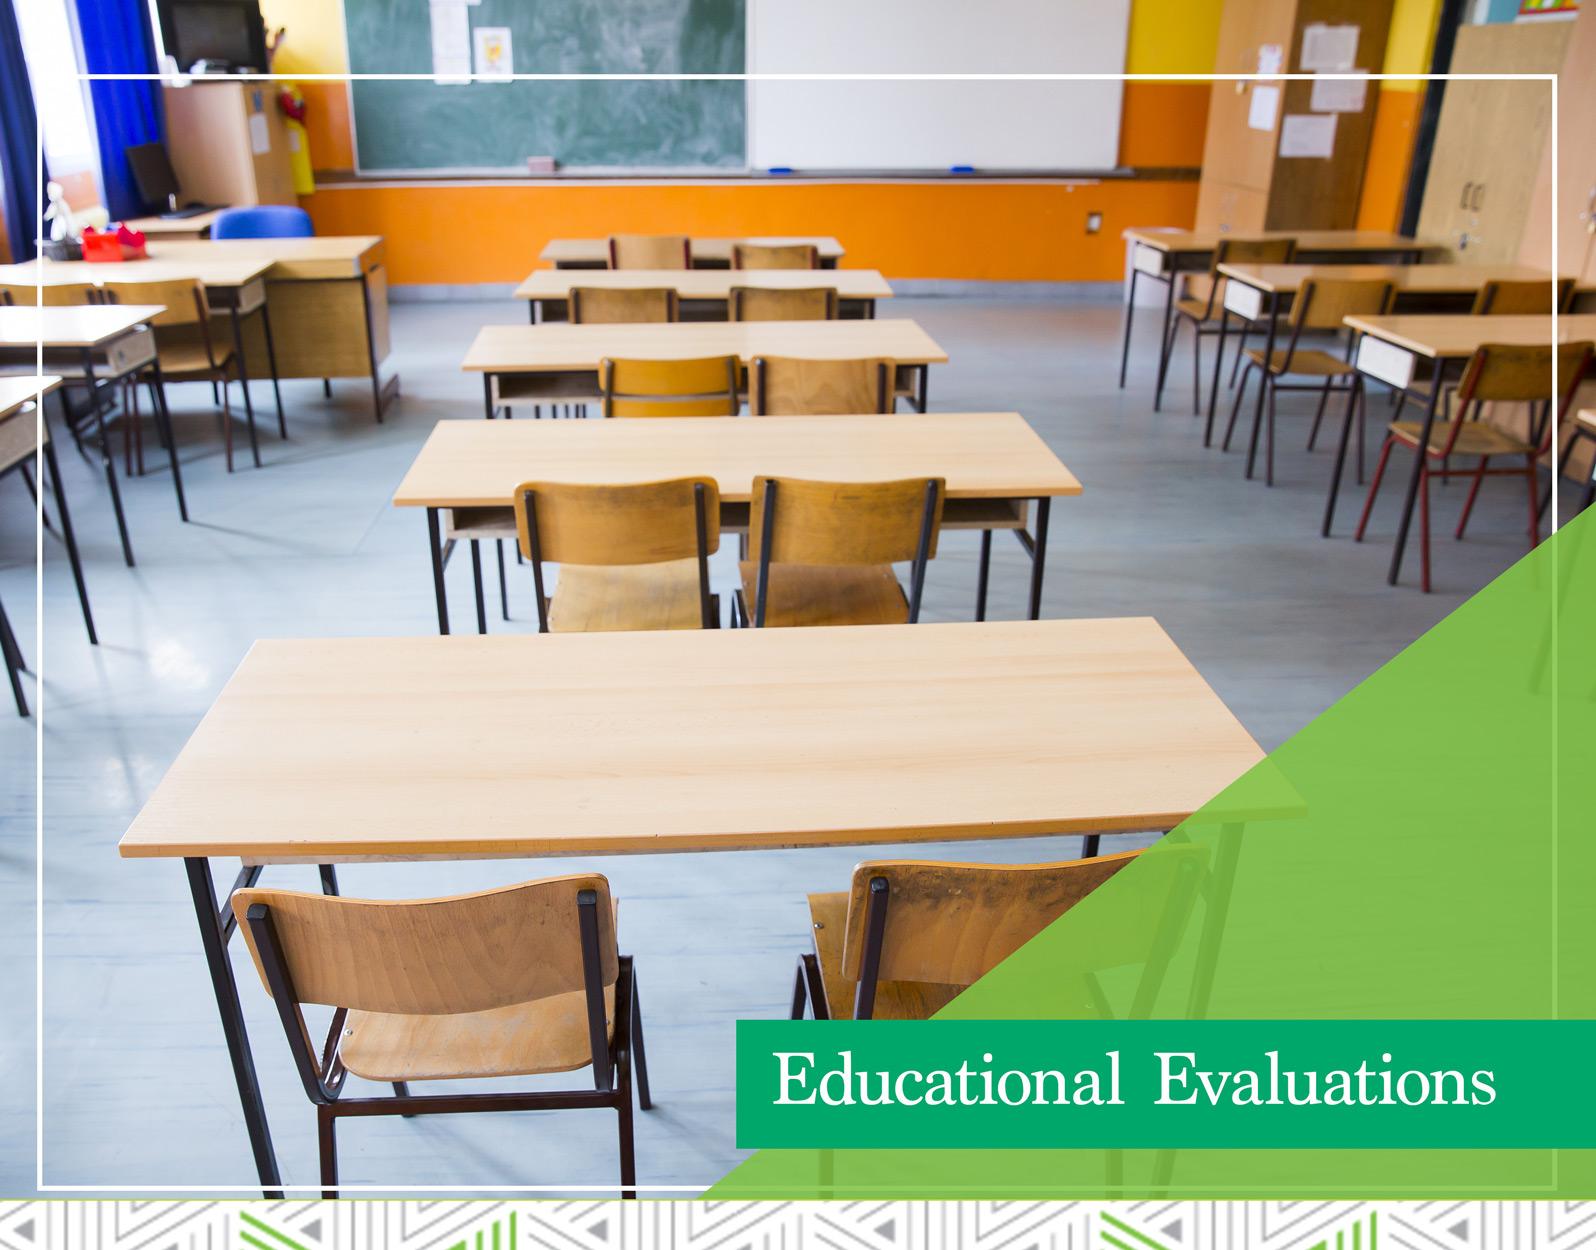 educational-evaluations-dml-leno.jpg